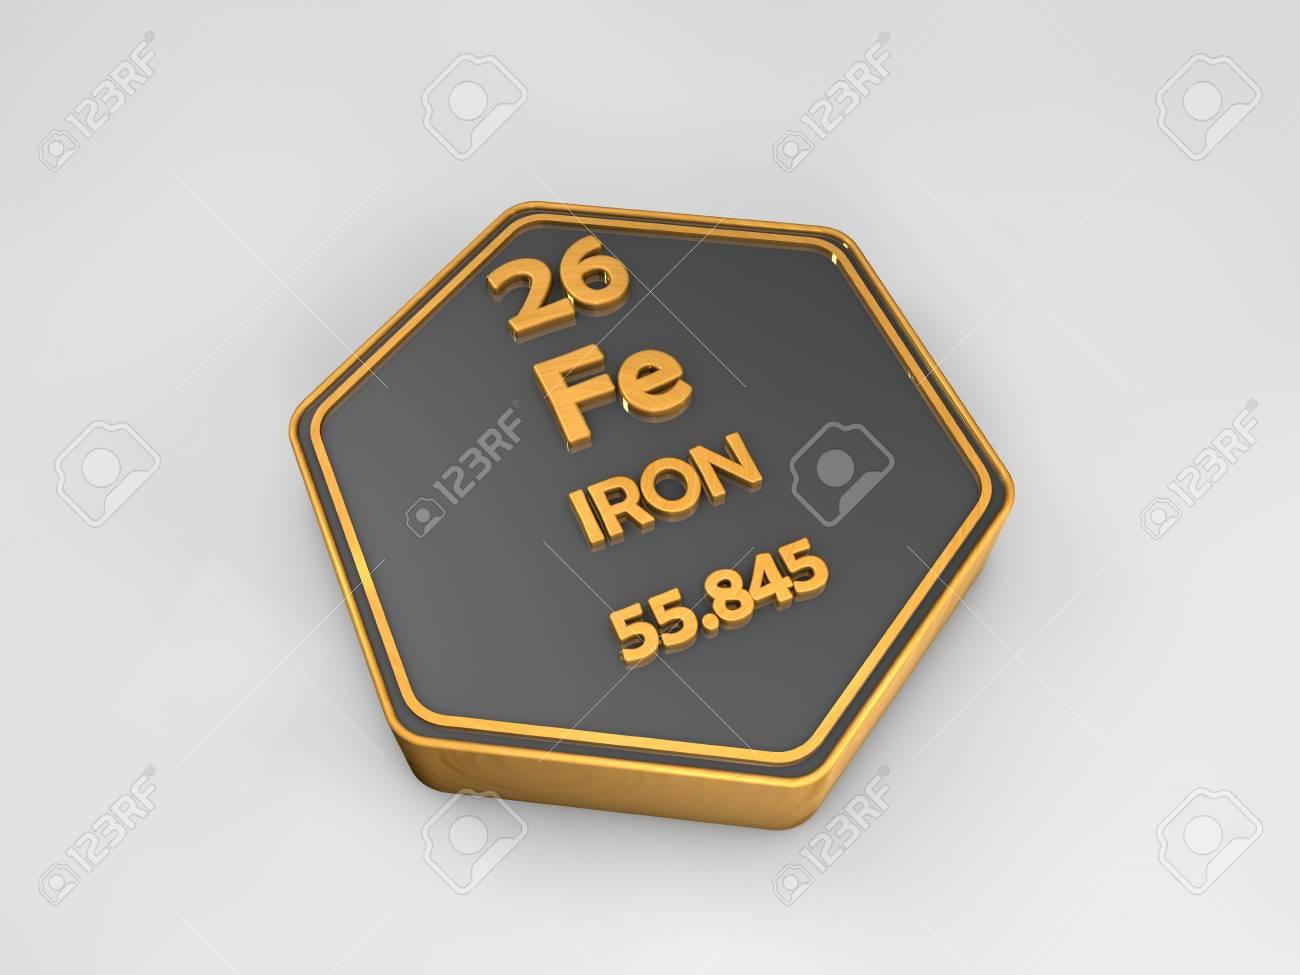 Iron Fe Chemical Element Periodic Table Hexagonal Shape 3d